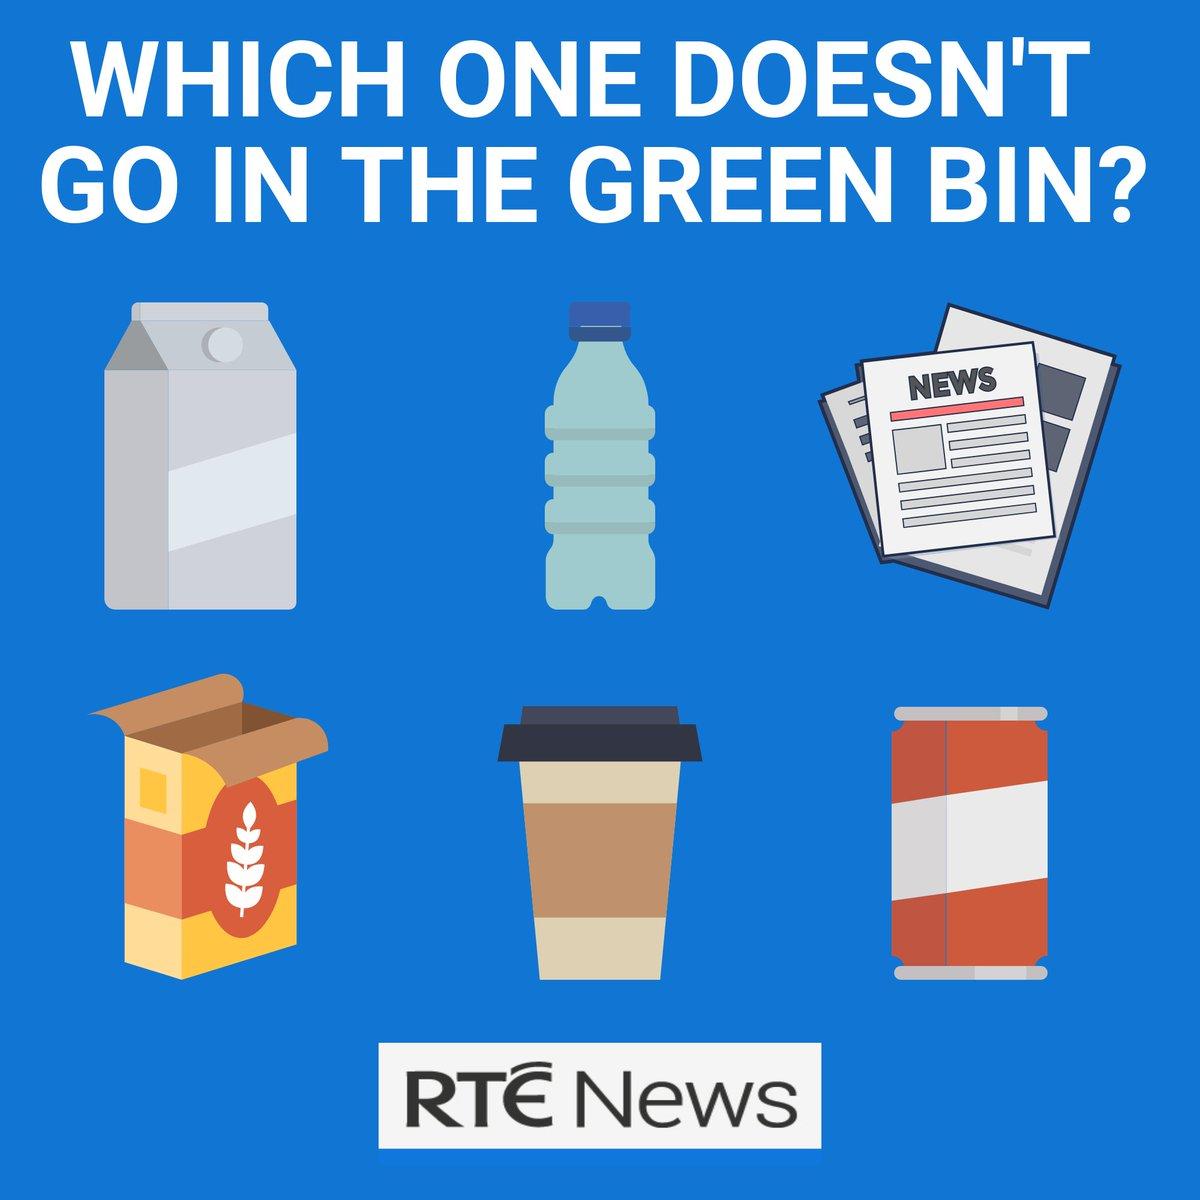 RTÉ News on Twitter: